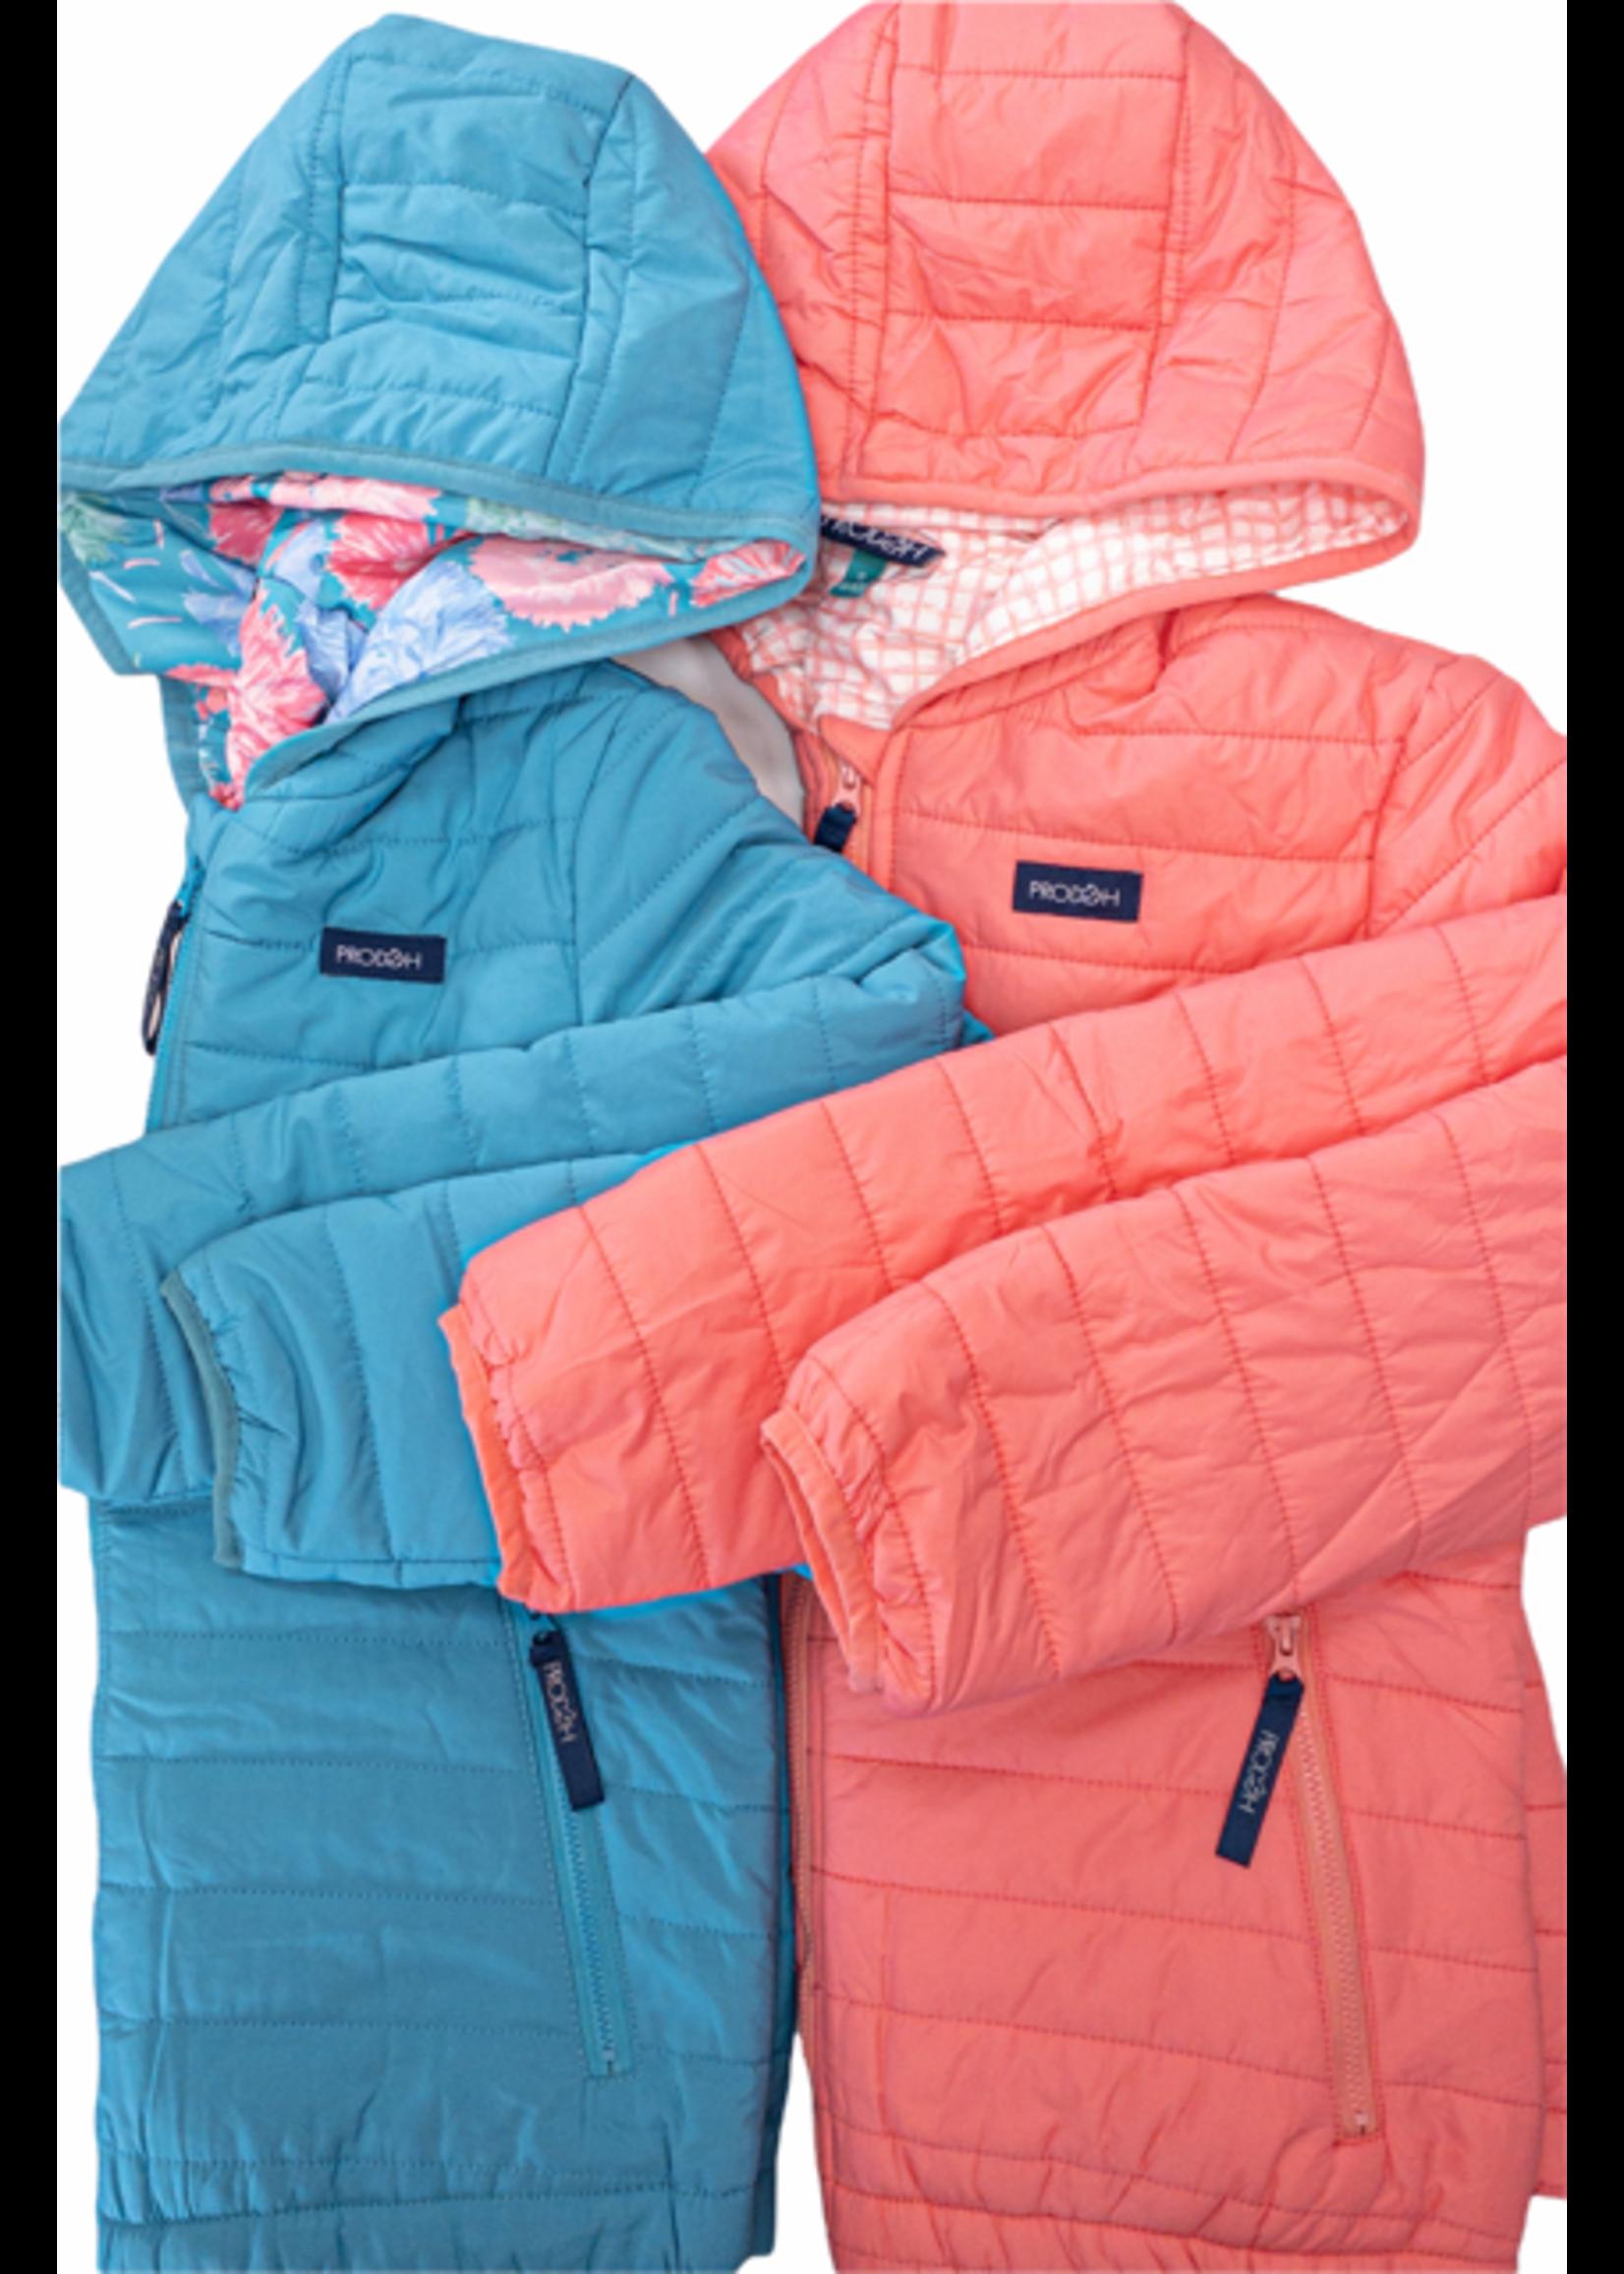 Prodoh Hooded Puffer Jacket